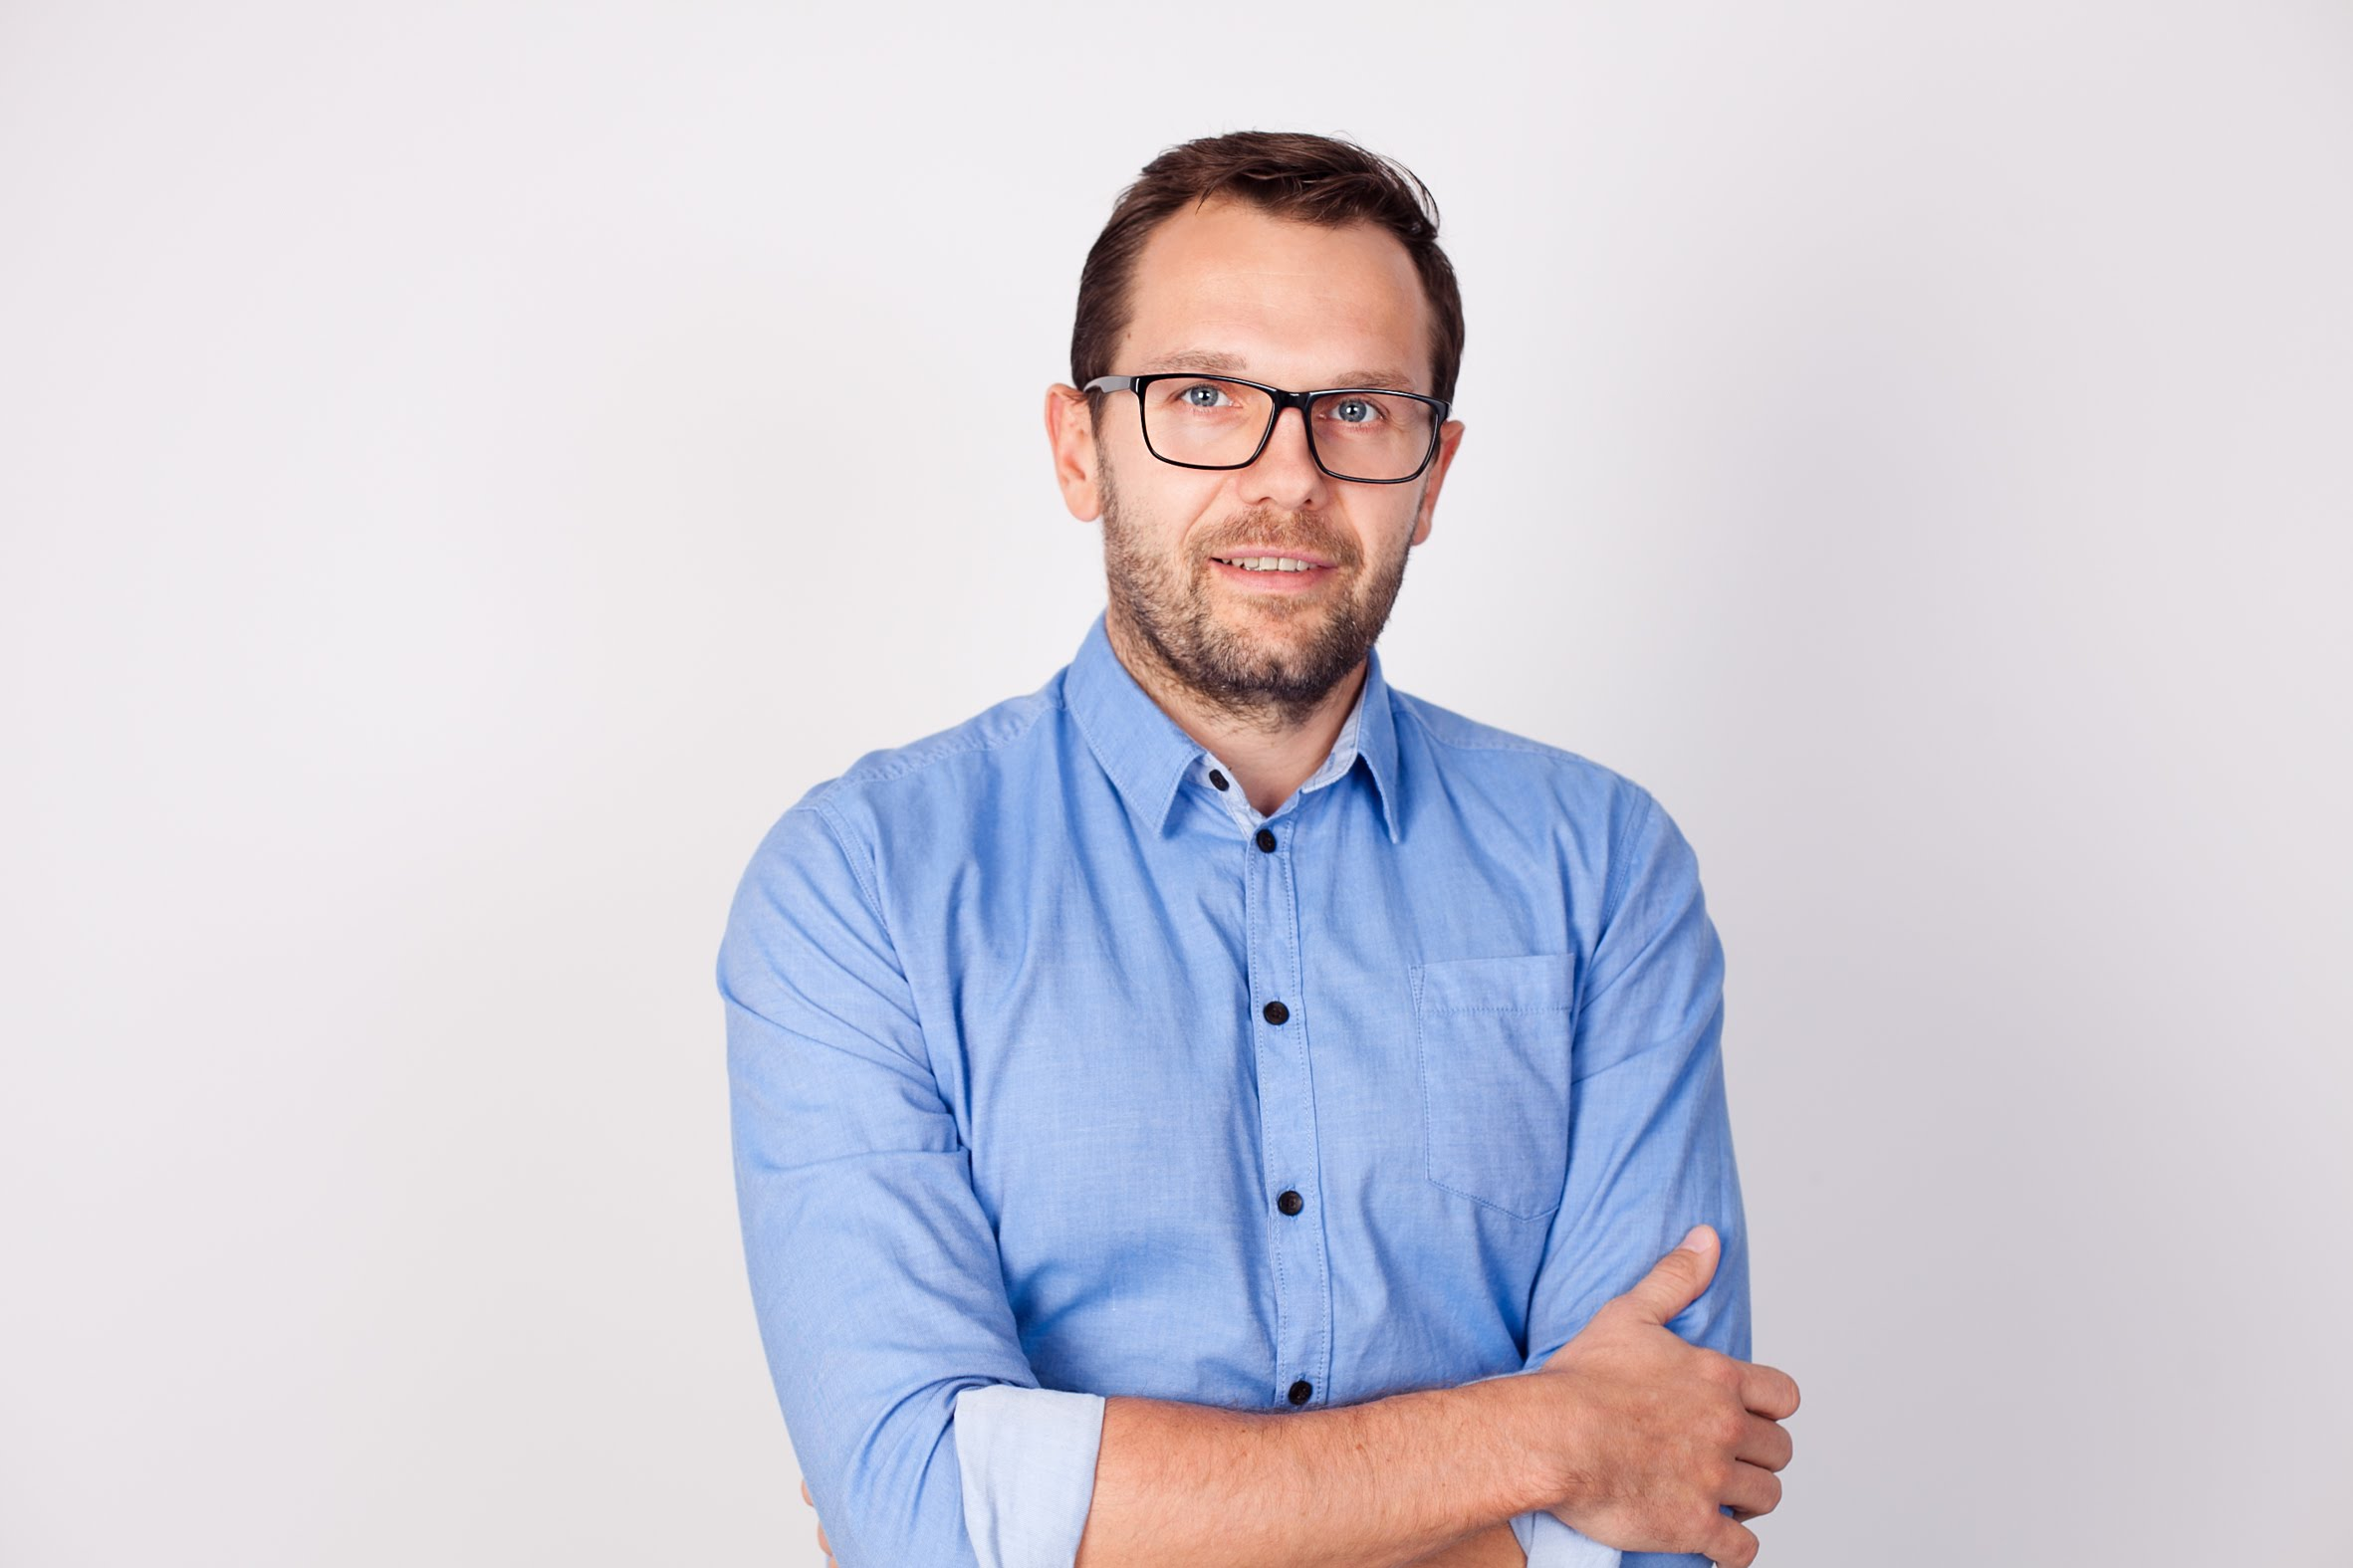 Michał Partyka